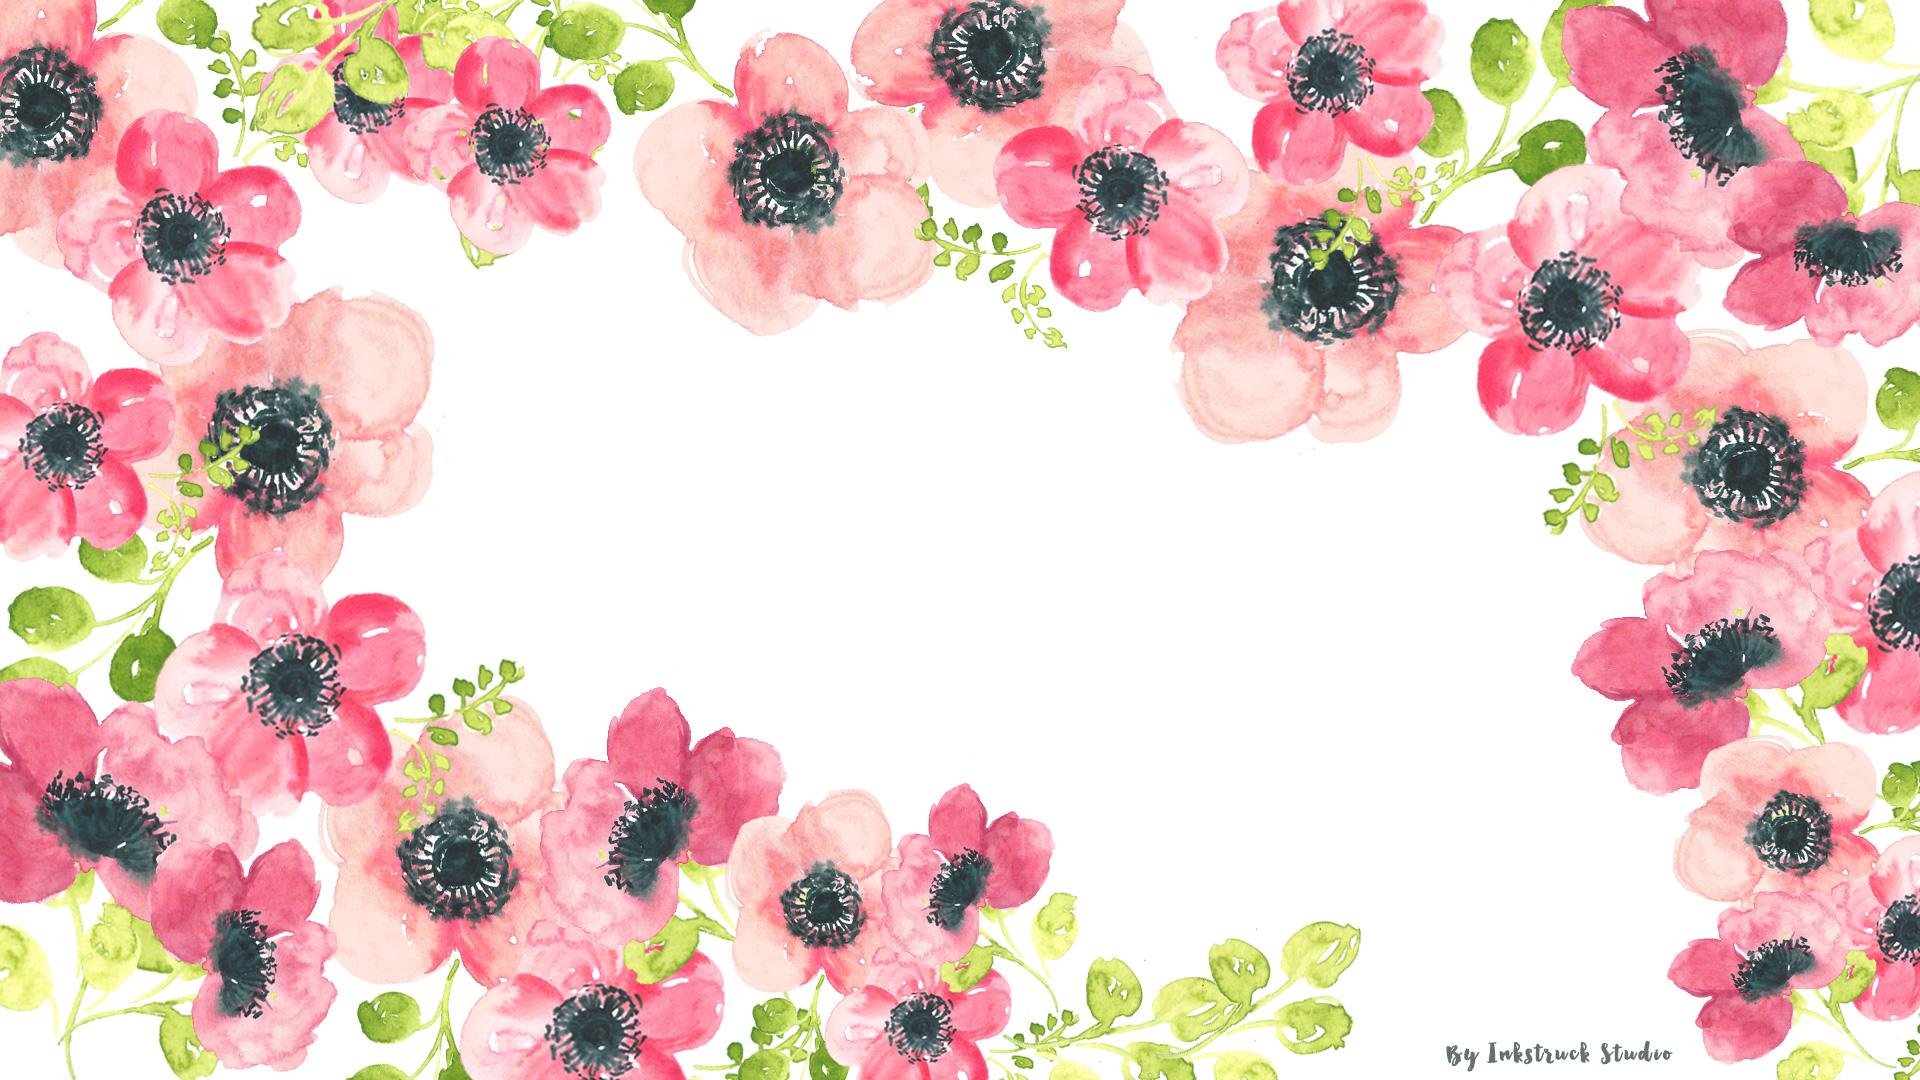 Watercolor Background Wallpaper At Getdrawings Free Download